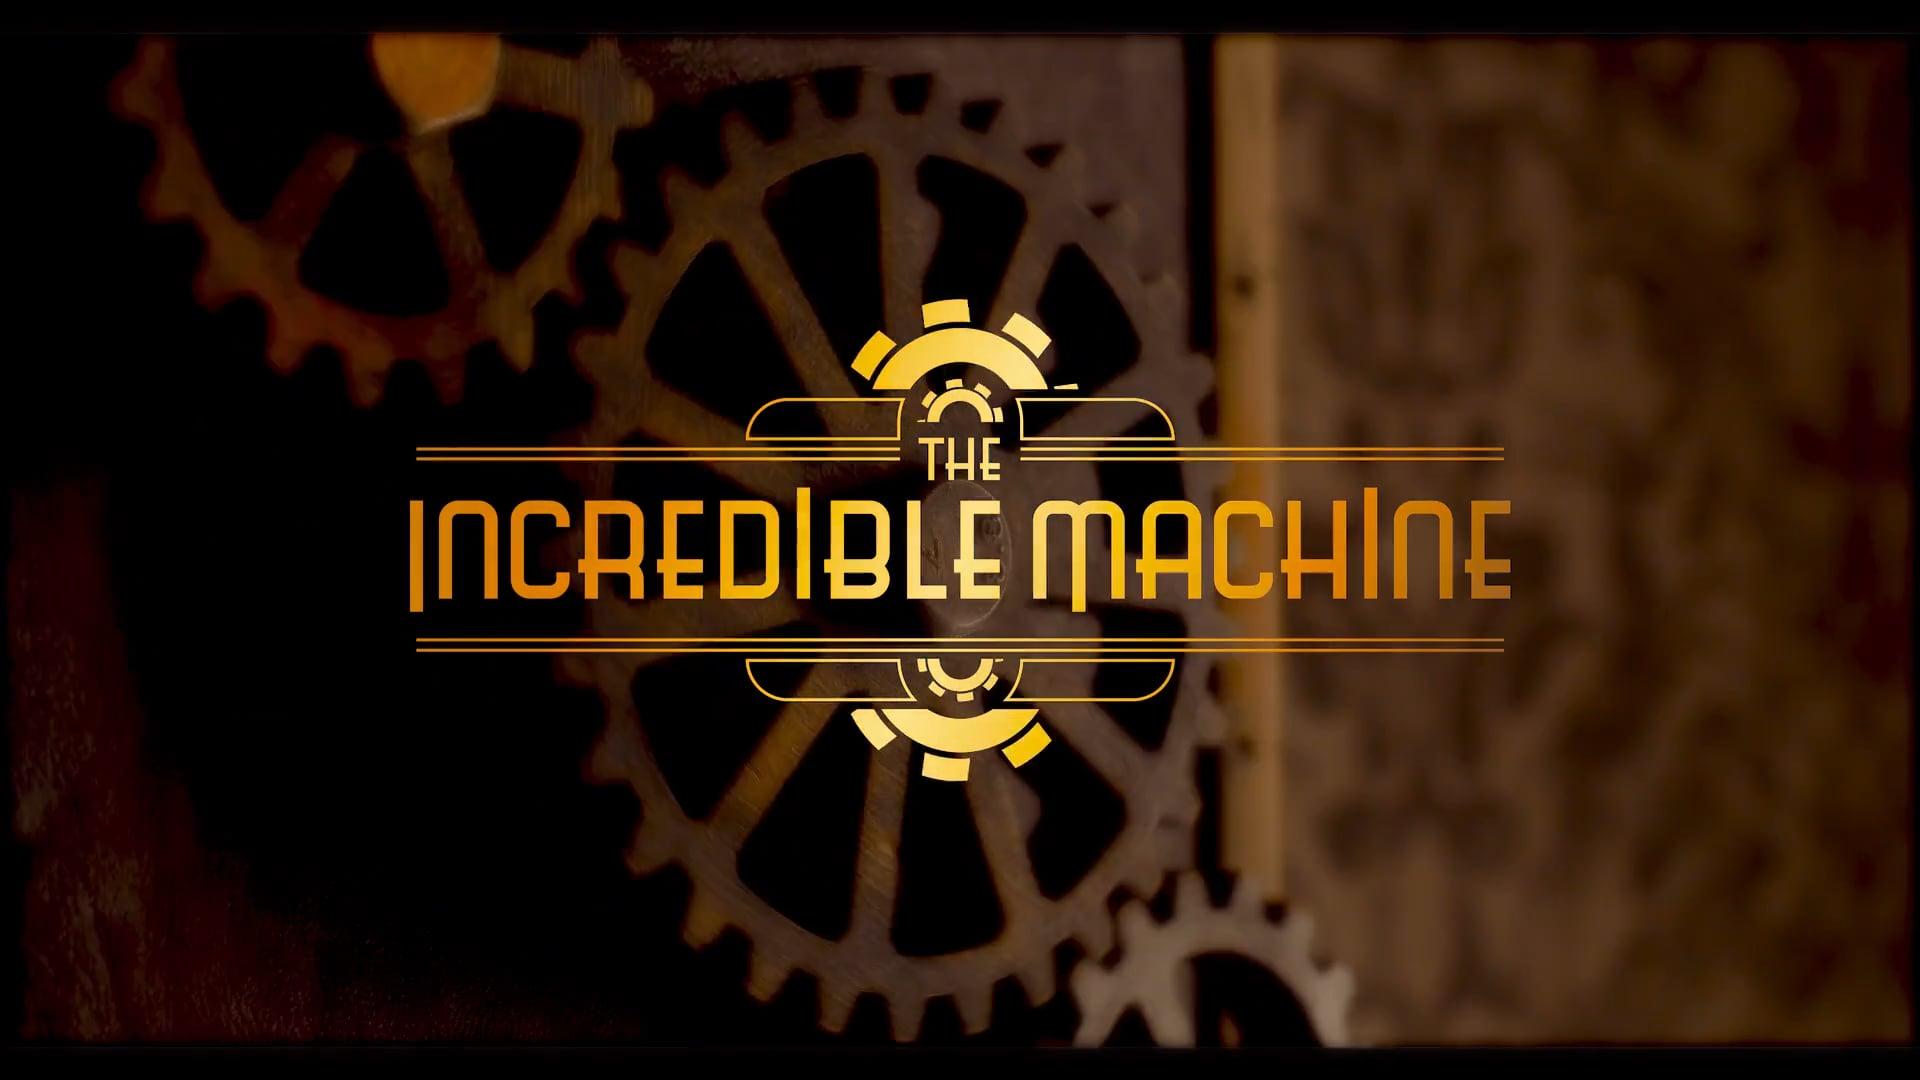 The Incredible Machine // Clockwise Escape